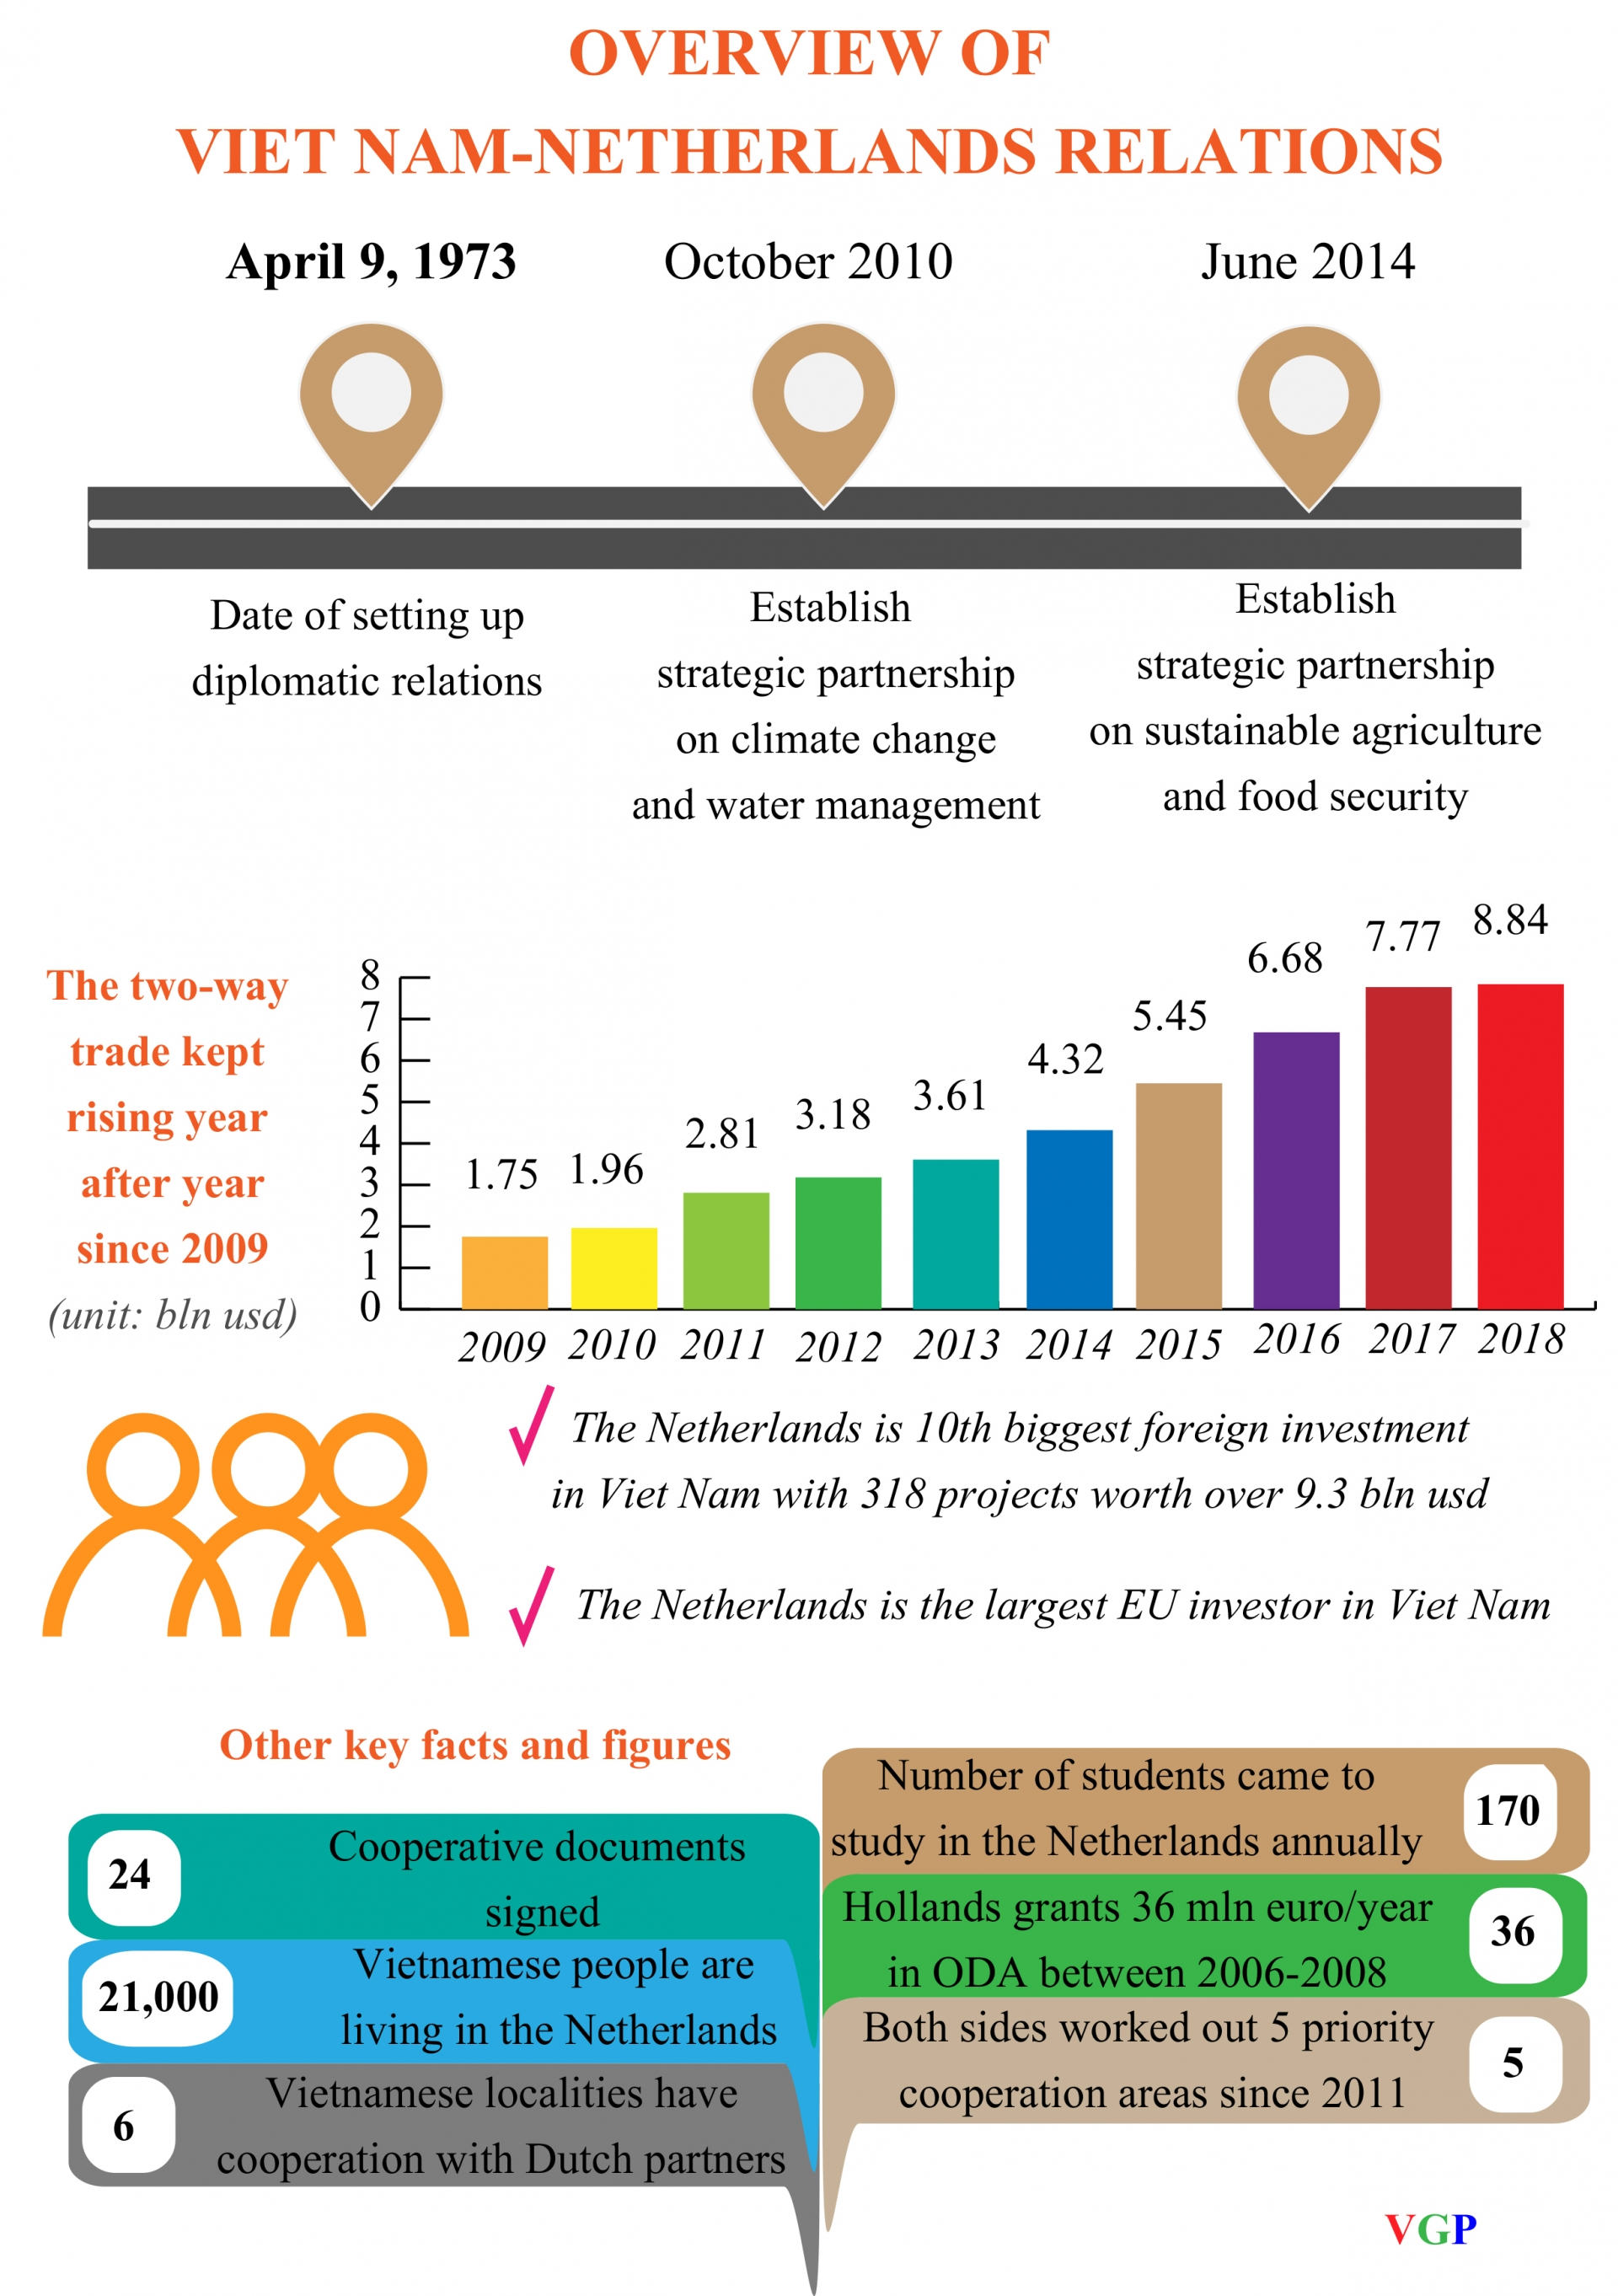 overview of viet nam netherlands relations